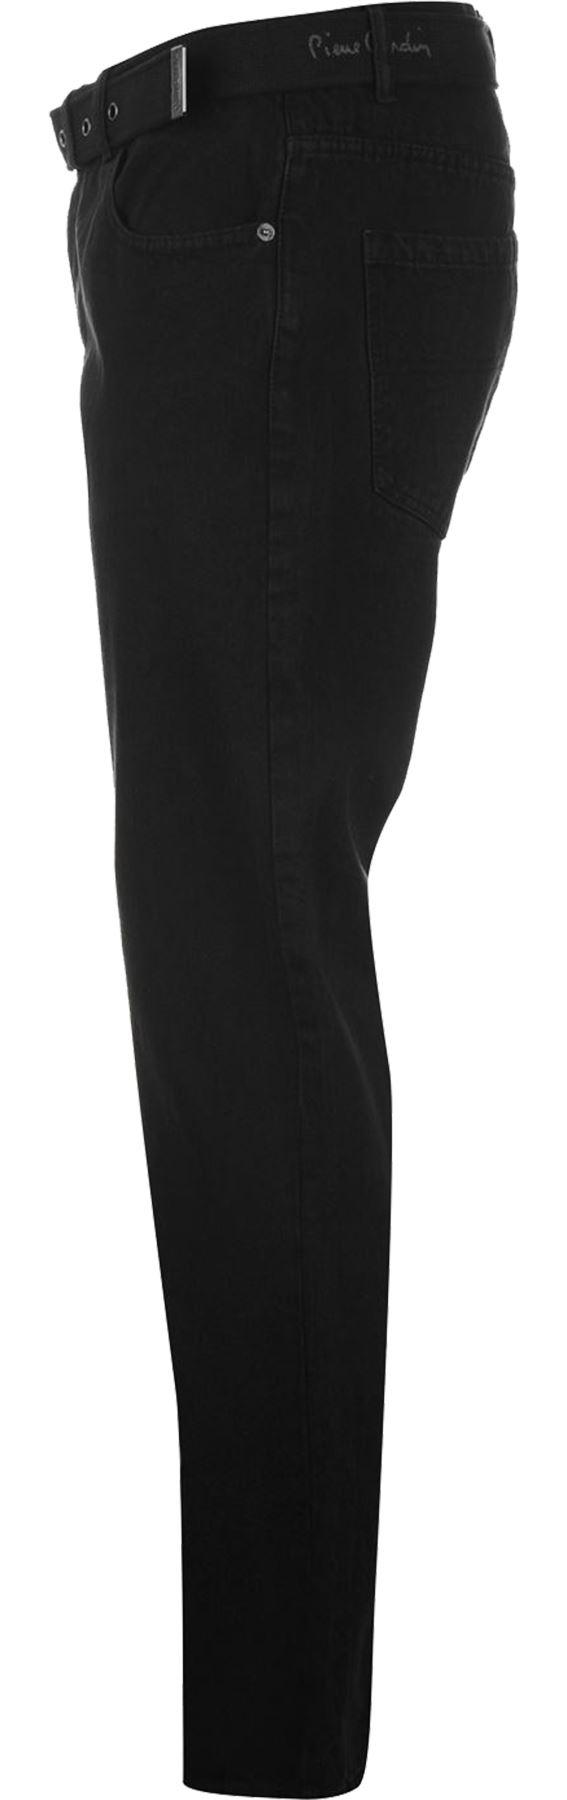 Mens-Belted-Denim-Jeans-Straight-Leg-Regular-Fit-Pierre-Cardin-Pants-Big-Tall thumbnail 3